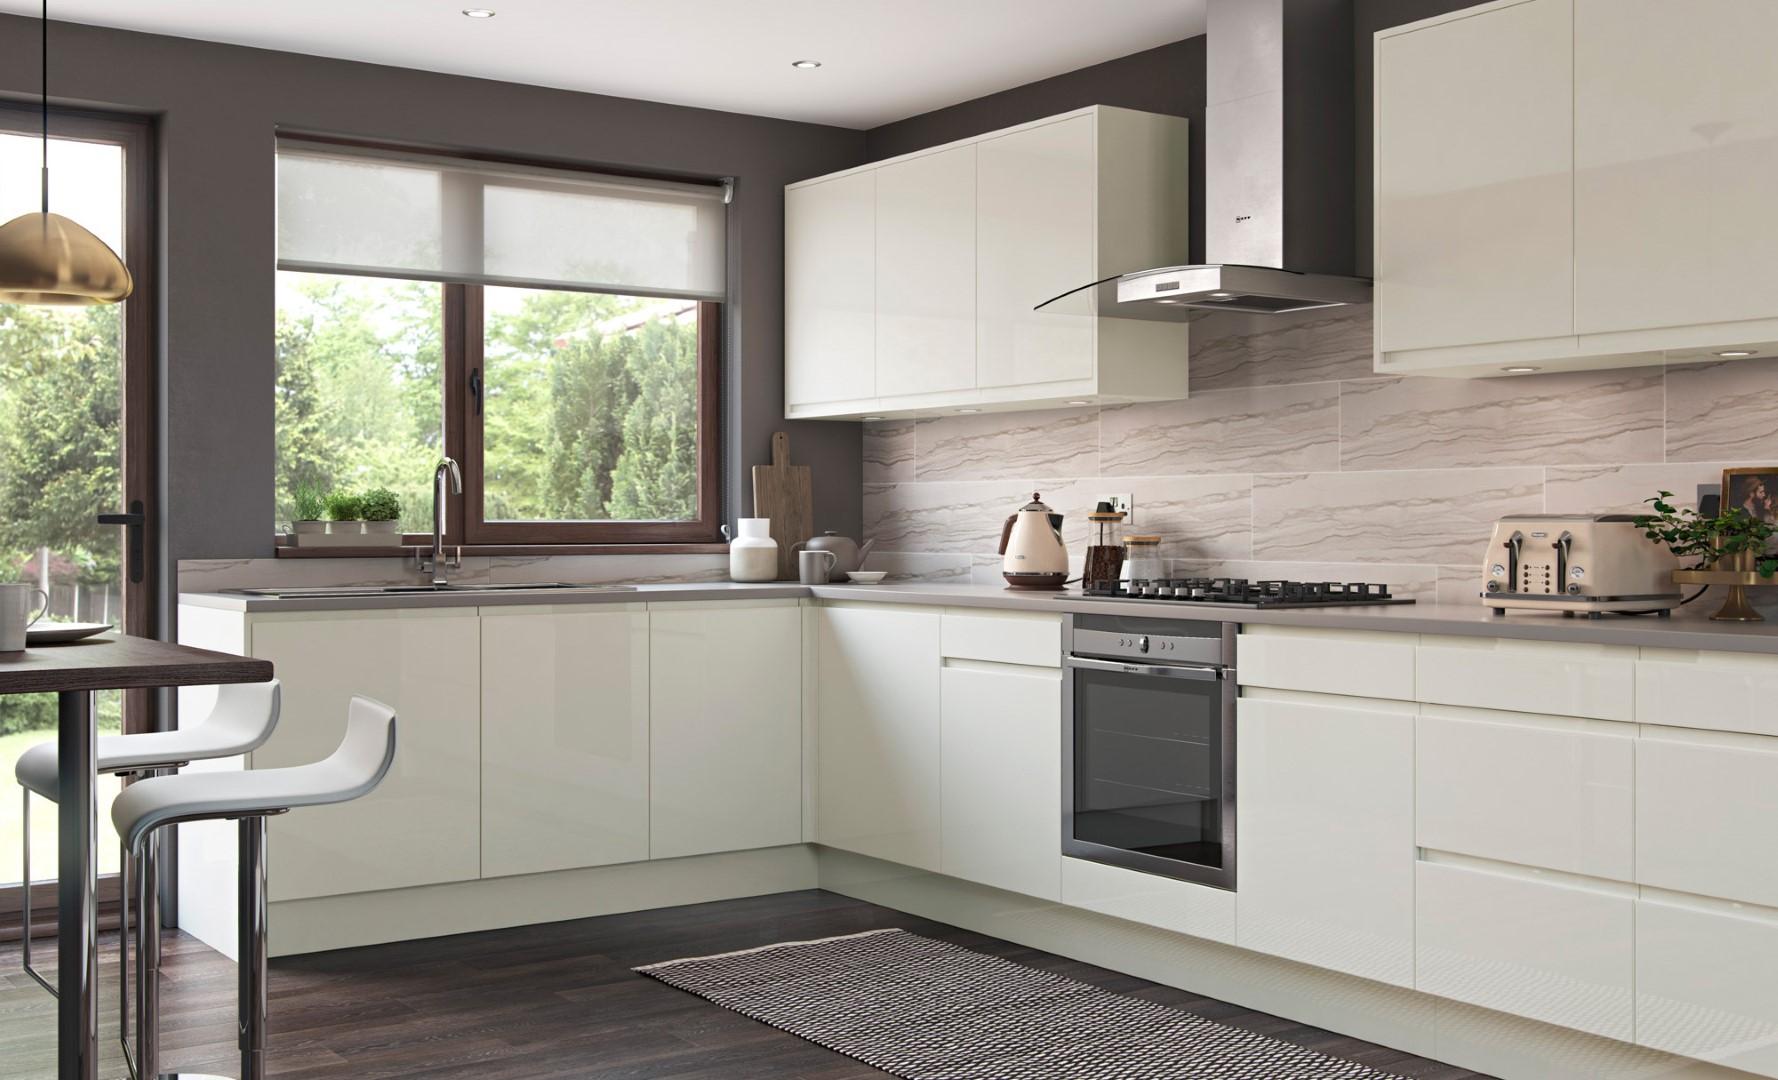 Modern Contemporary Kitchen - Strada Gloss Porcelain Kitchen - Kitchen Design - Alan Kelly Kitchens - Waterford